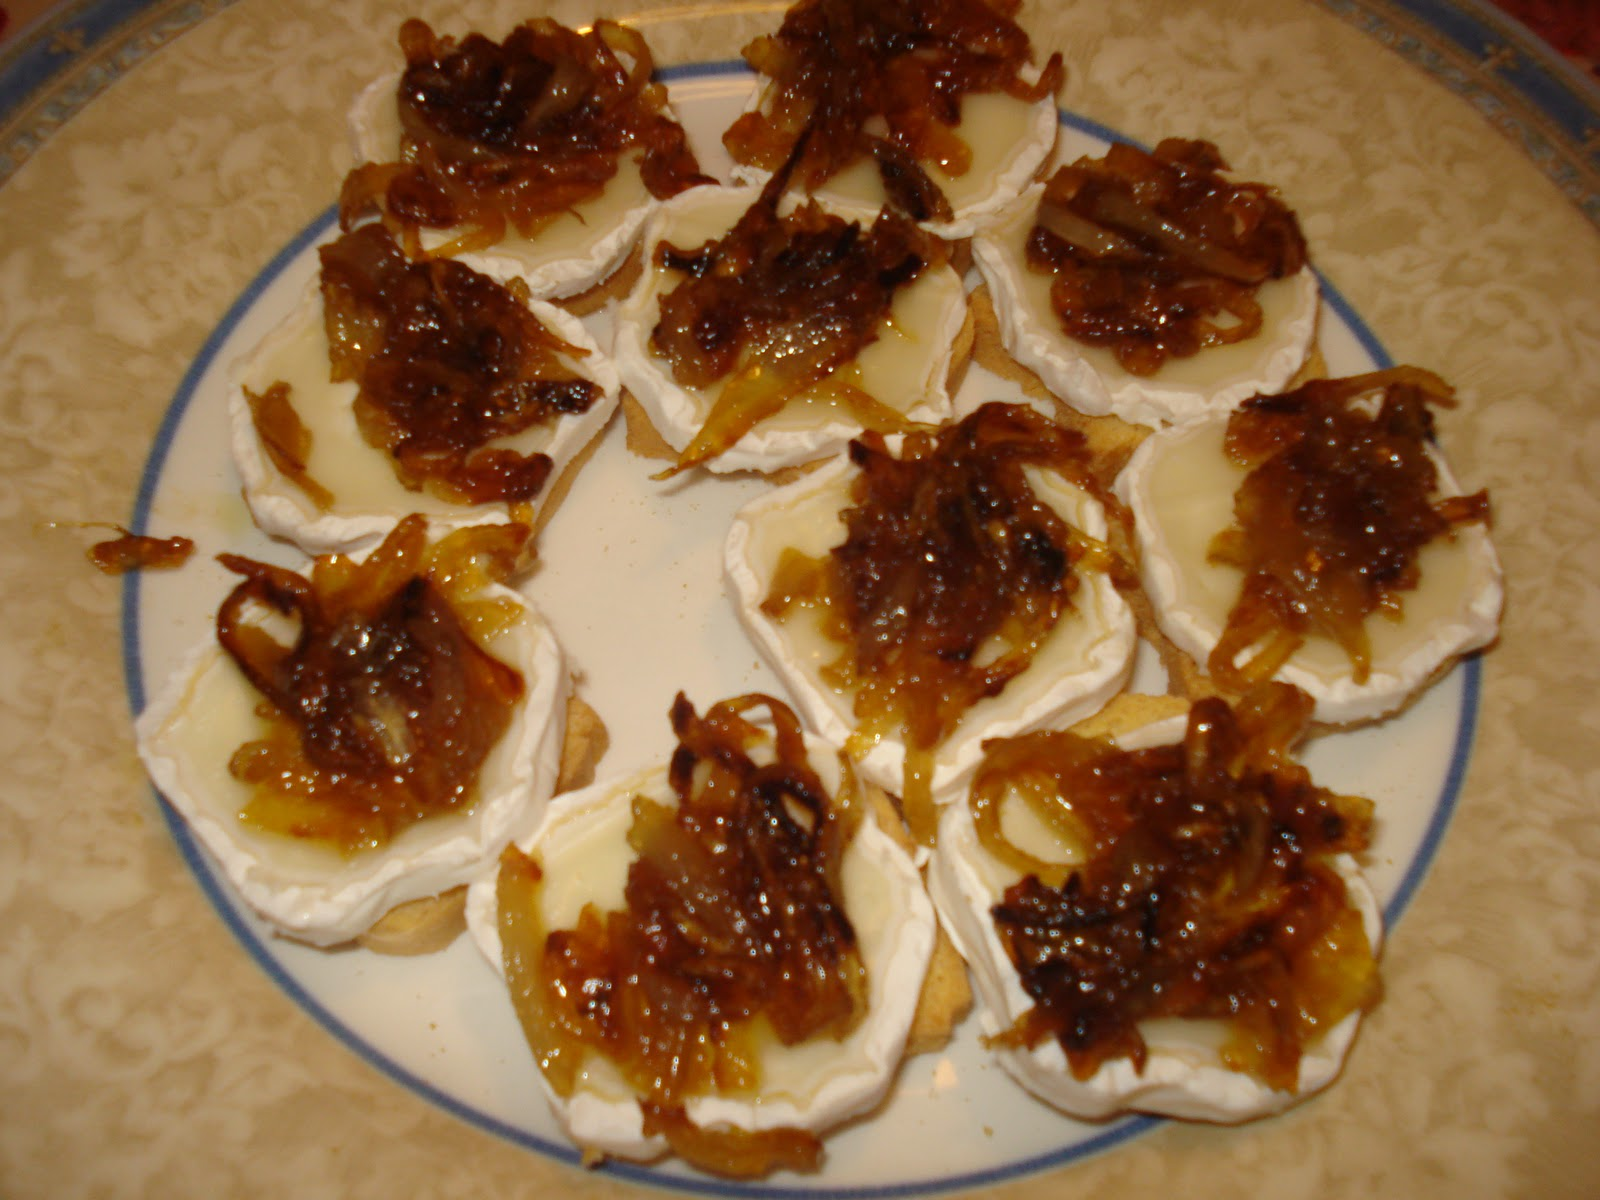 Tostadas de queso de cabra con cebolla caramelizada 4 1 5 for Canape queso de cabra